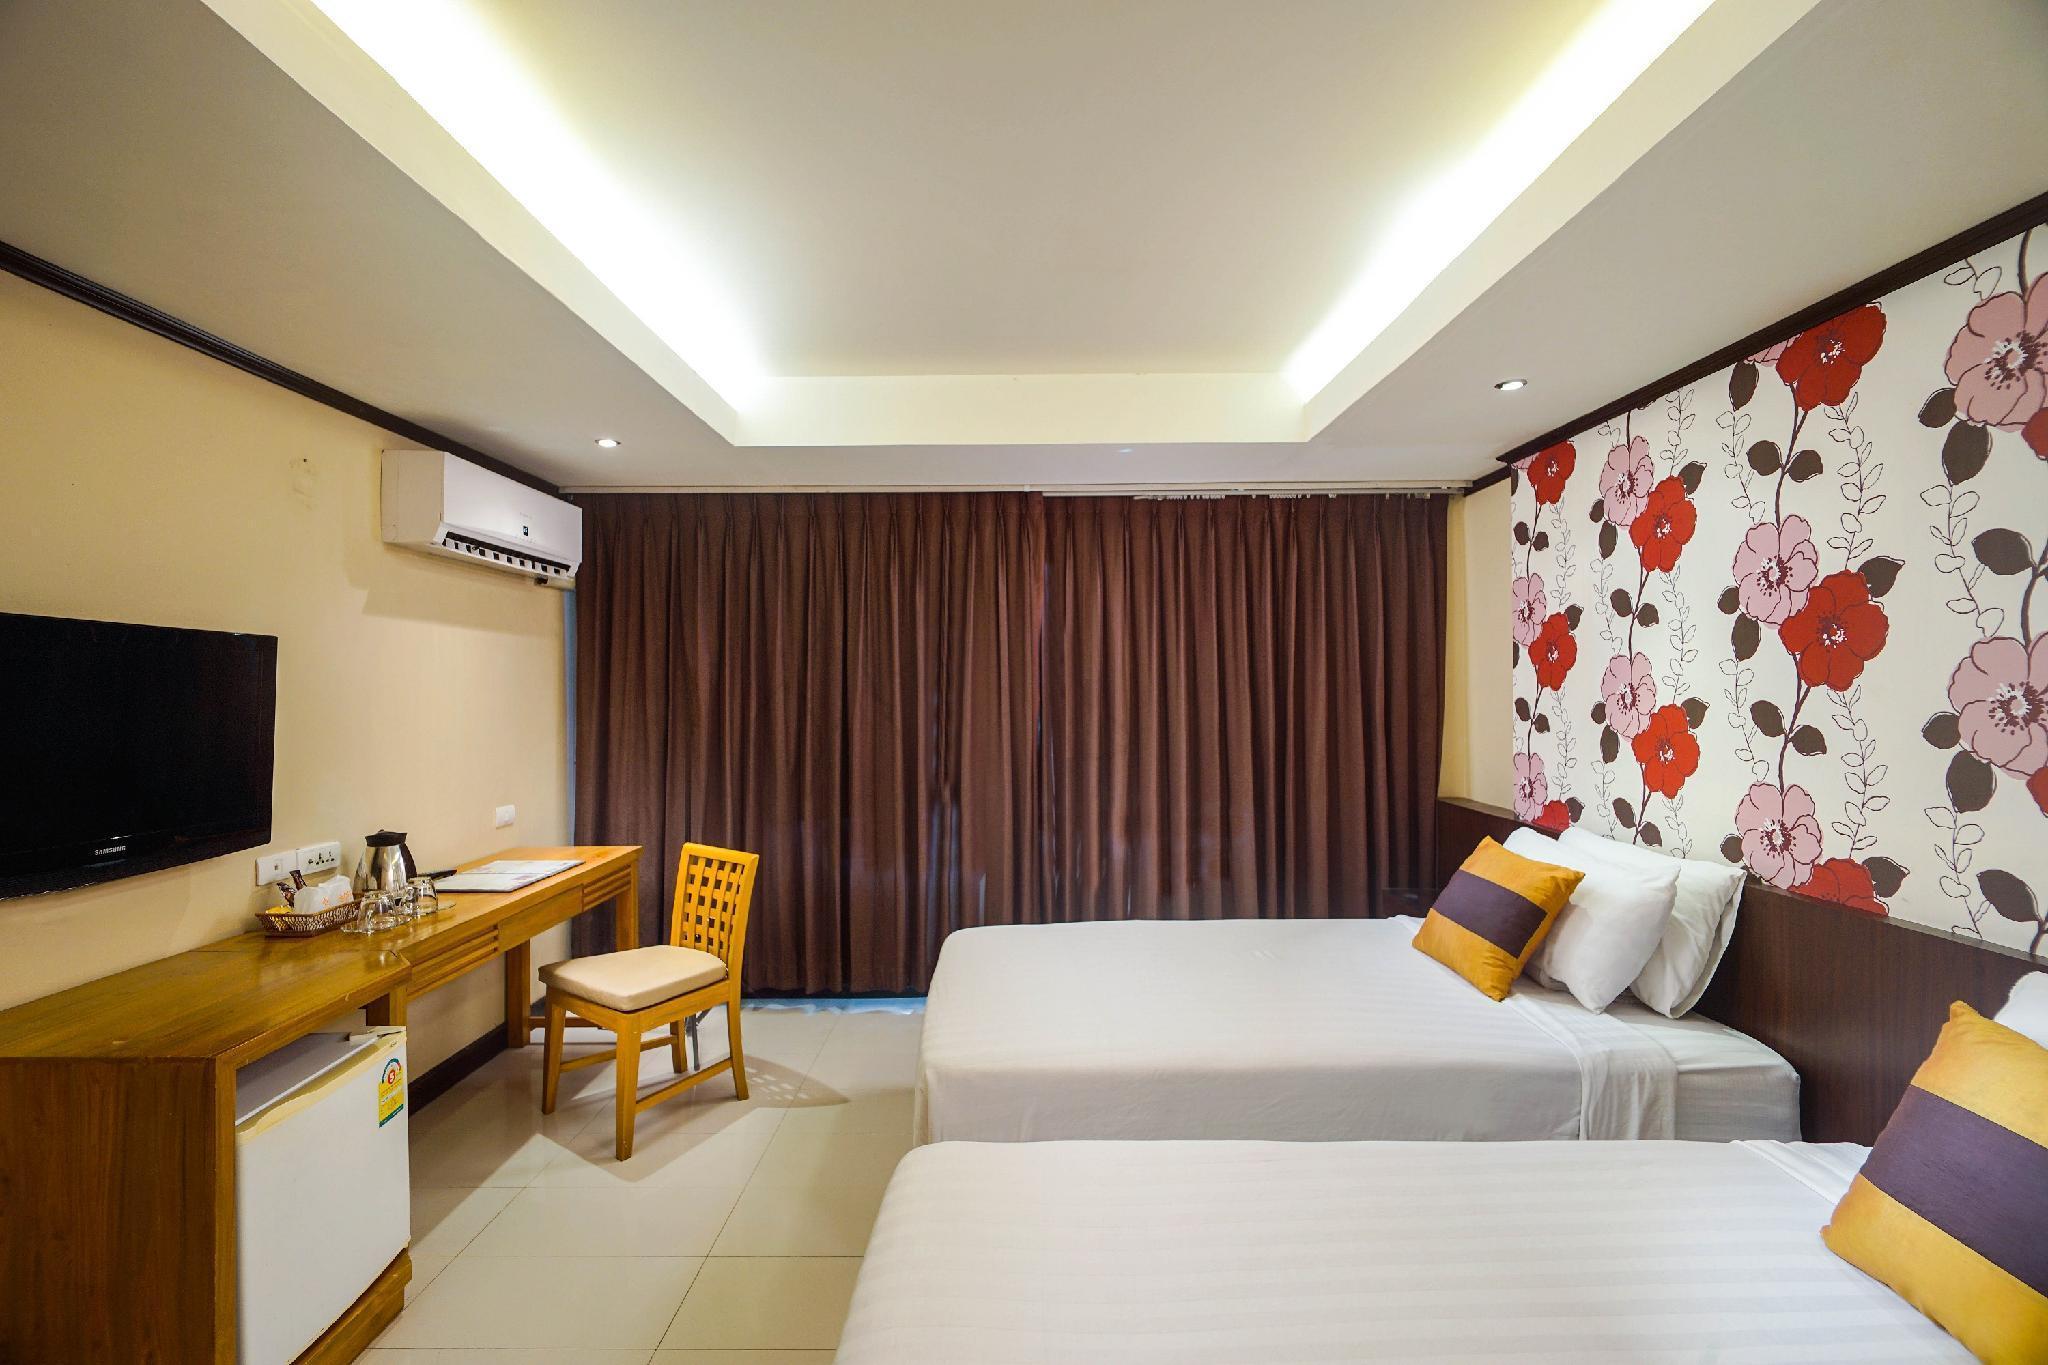 A2 Hotel Bangkok โรงแรม เอ2 กรุงเทพฯ